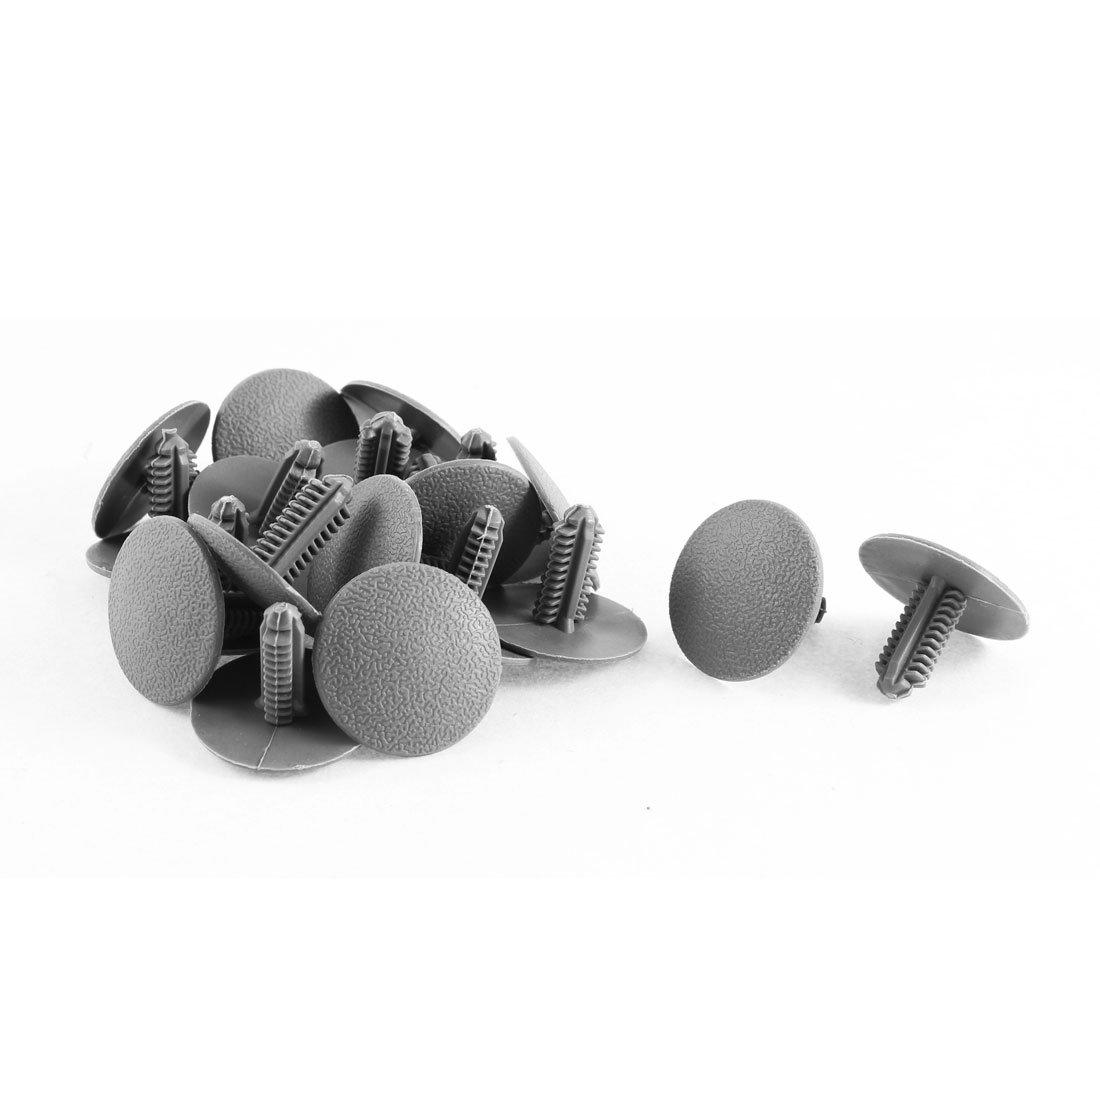 7.5mm Loch Durchmesser Grau Kunststoff Niet Verkleidung Befestigung Nieten Clips de 20 Stk